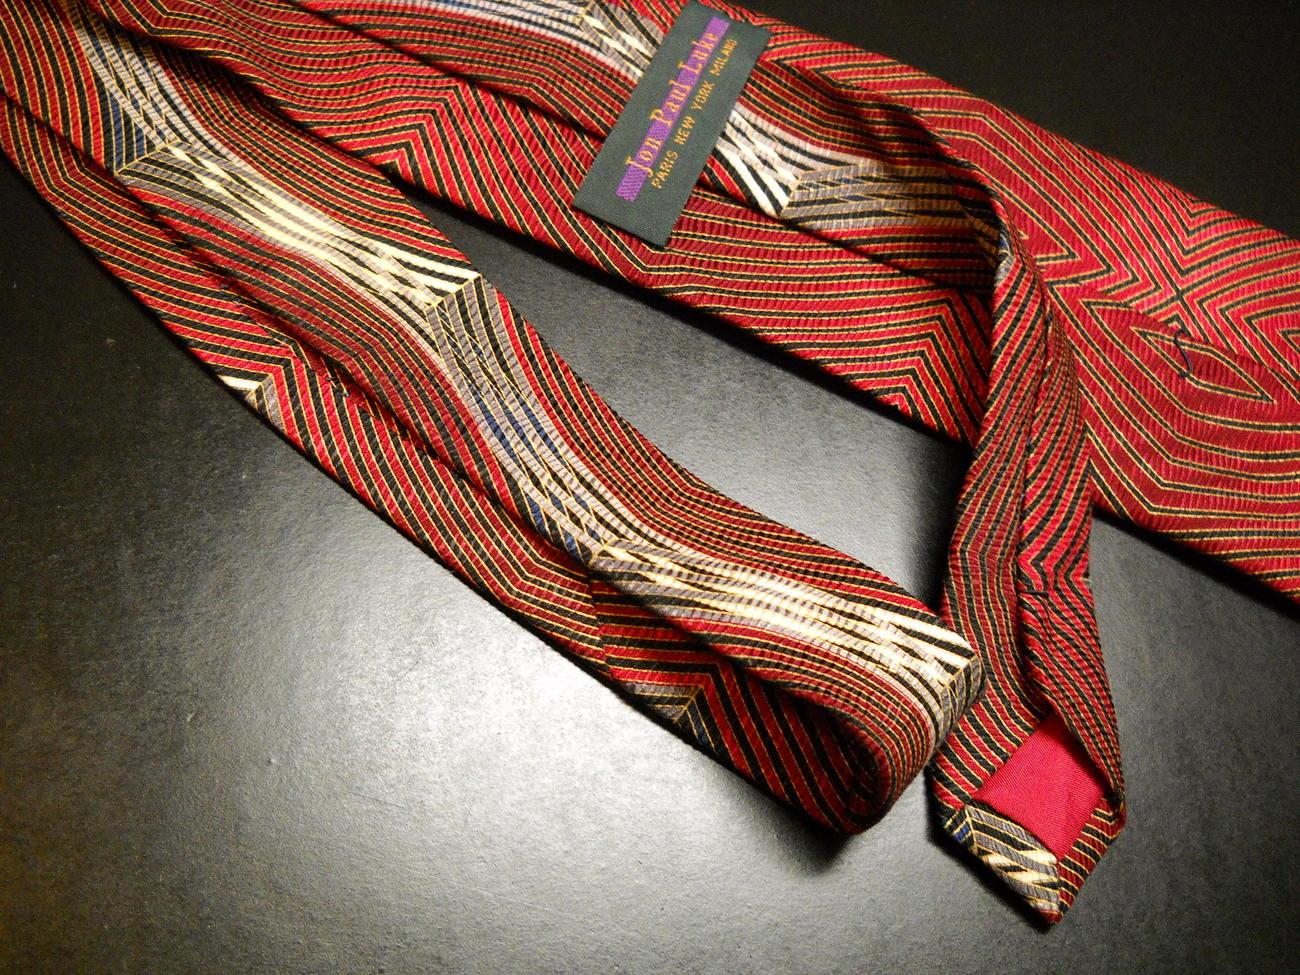 Jon Paul Luke Neck Tie Waves of Reds Golds Black Silk Hand Made Designed Italy